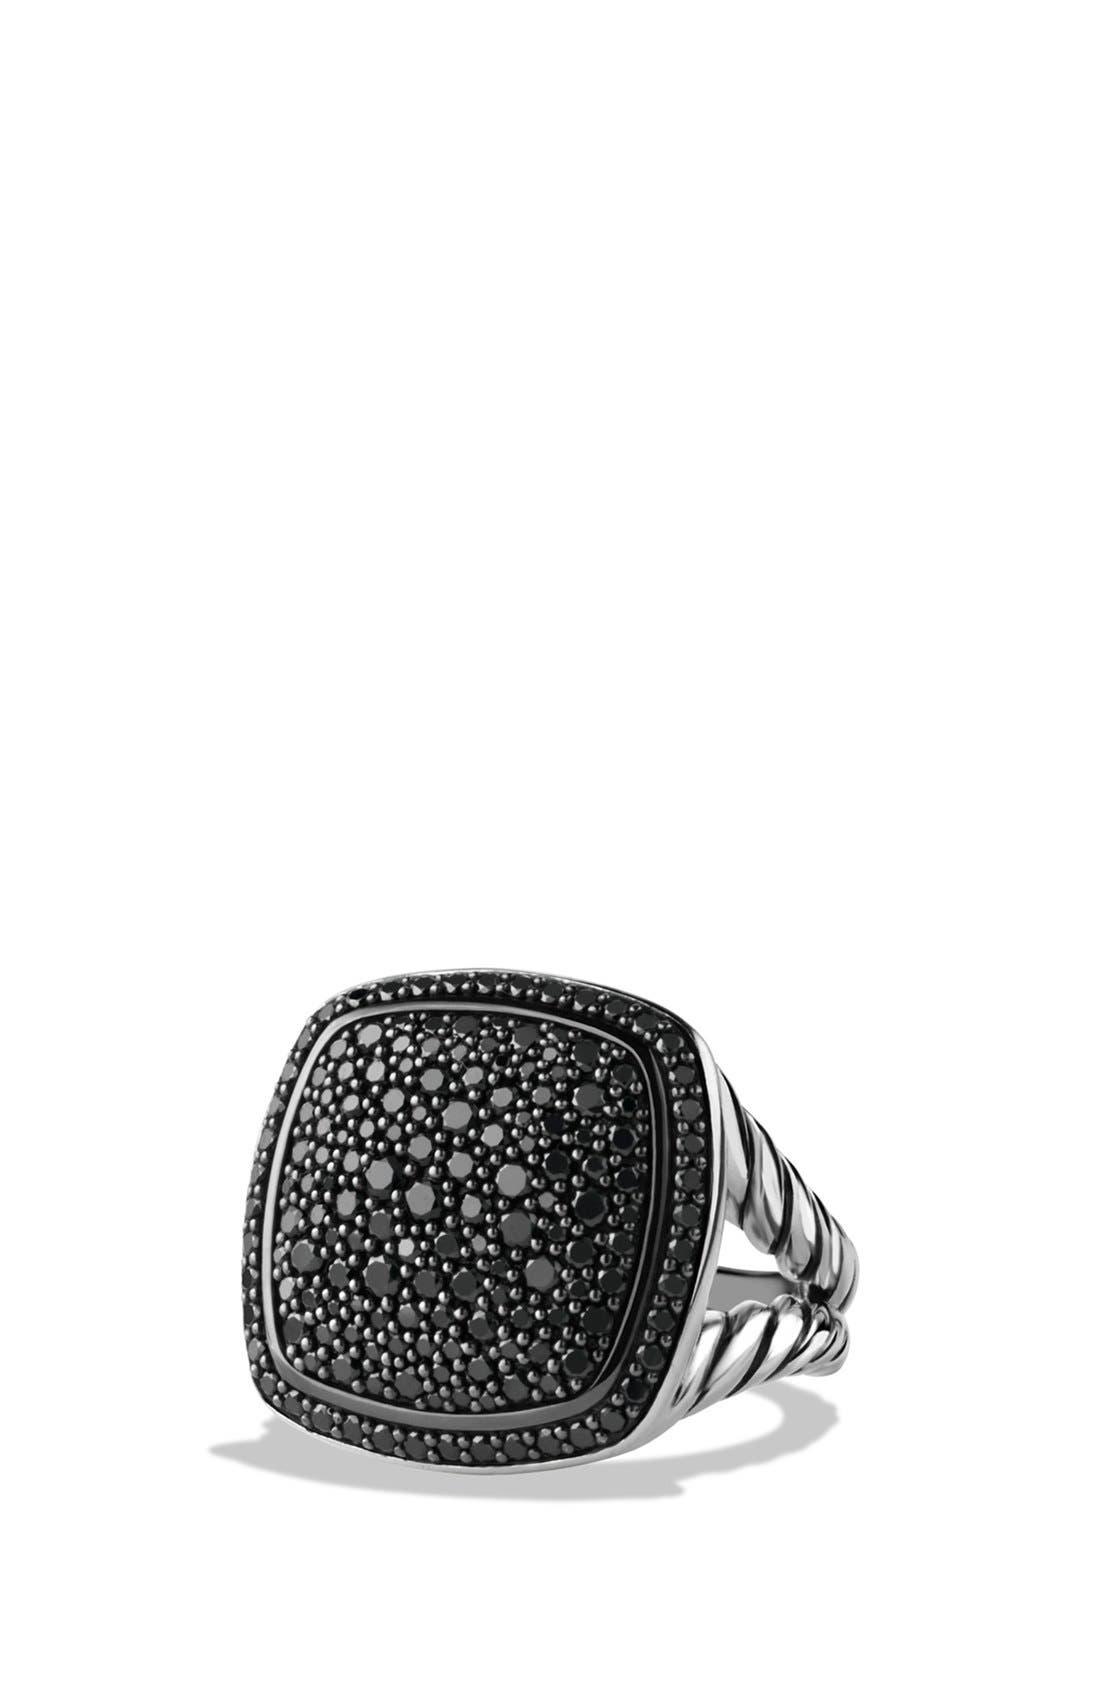 'Albion' Ring with Diamonds,                             Main thumbnail 1, color,                             BLACK DIAMOND